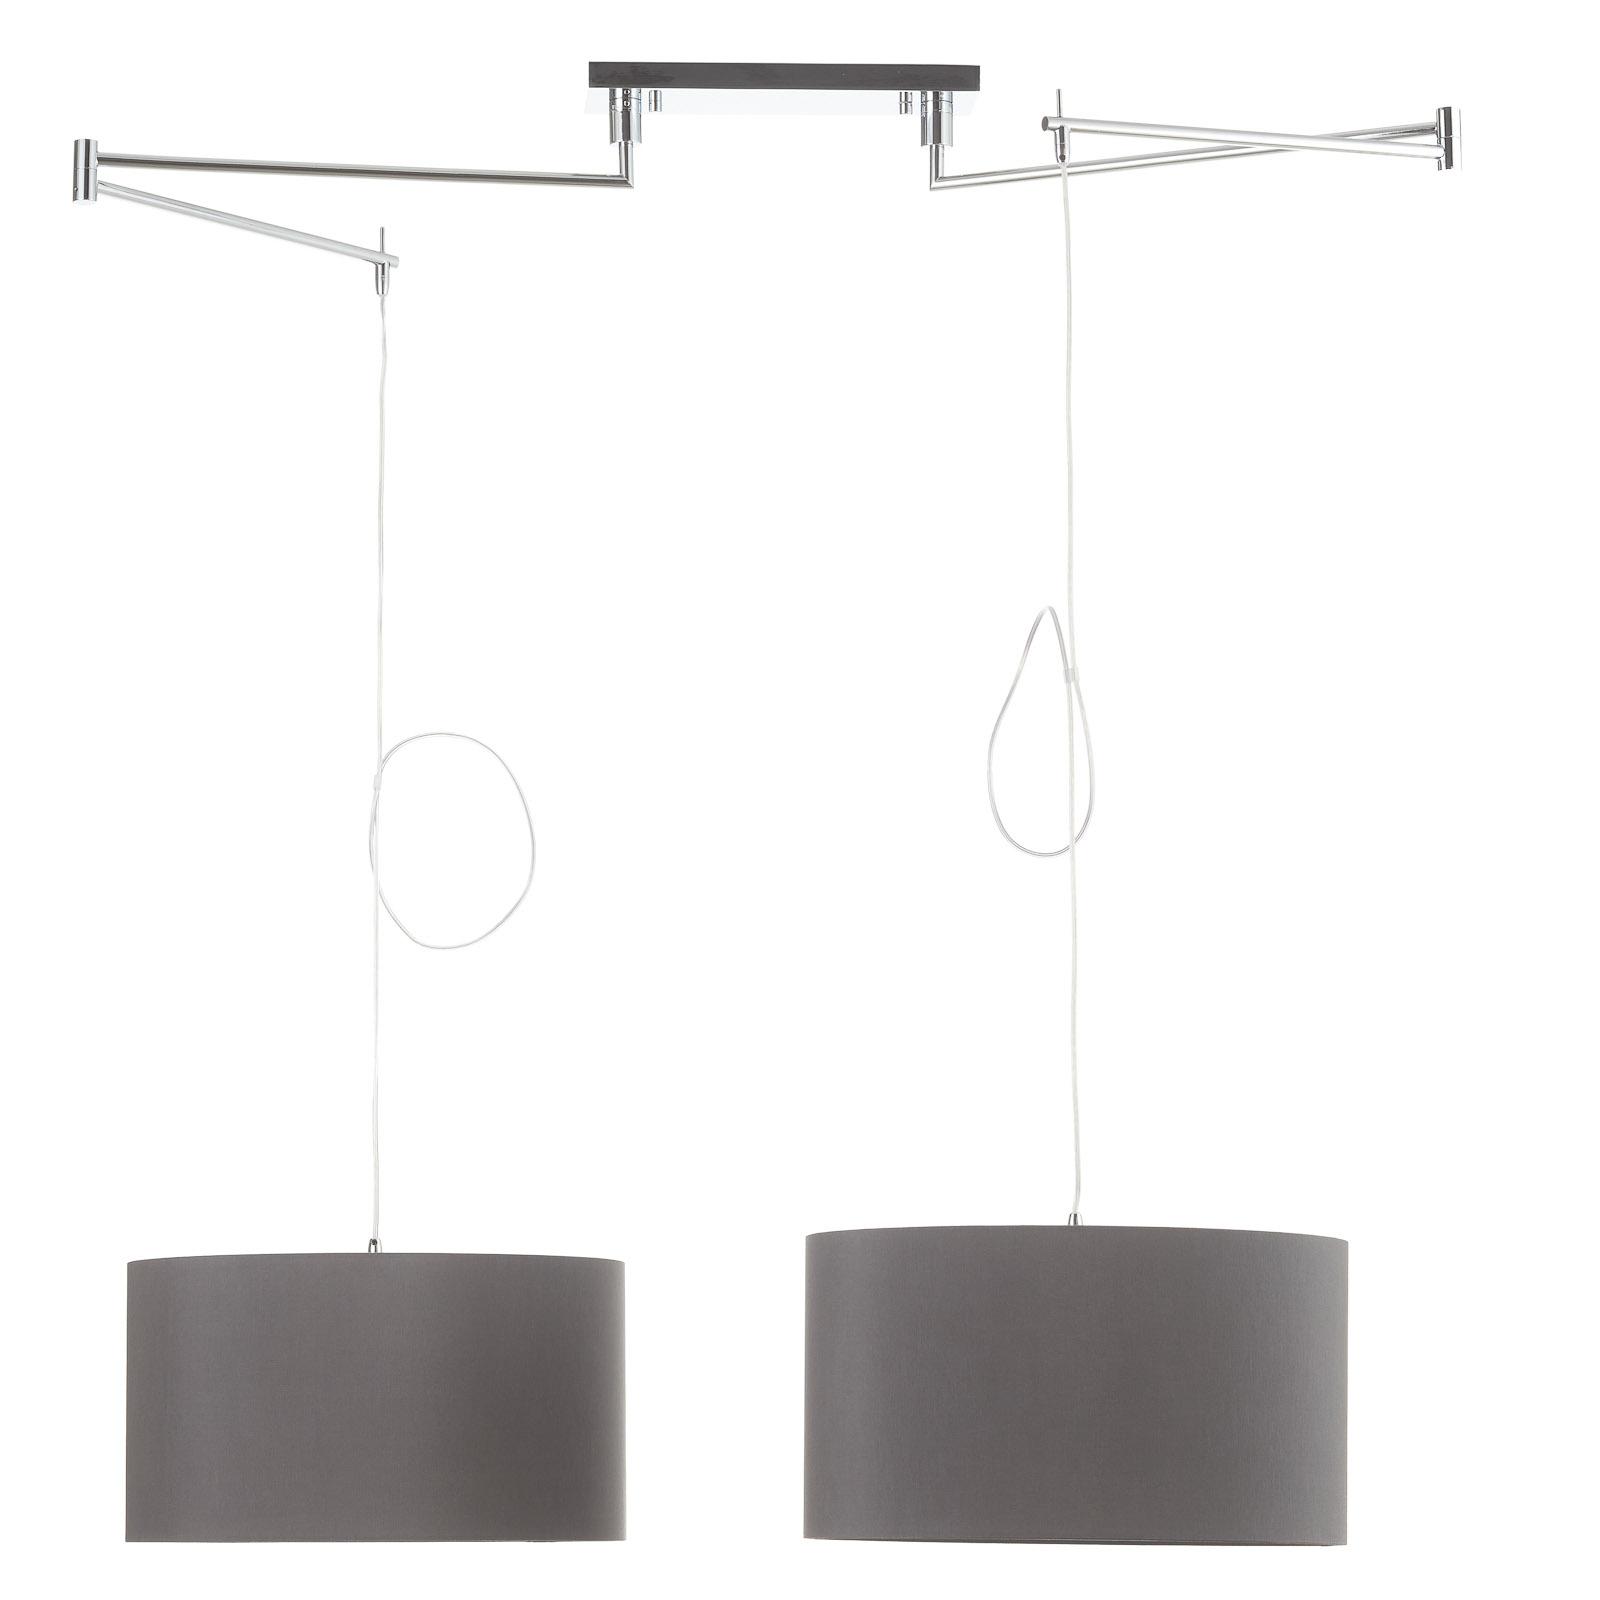 Helestra Certo hanglamp cilinder 2-lamps antraciet